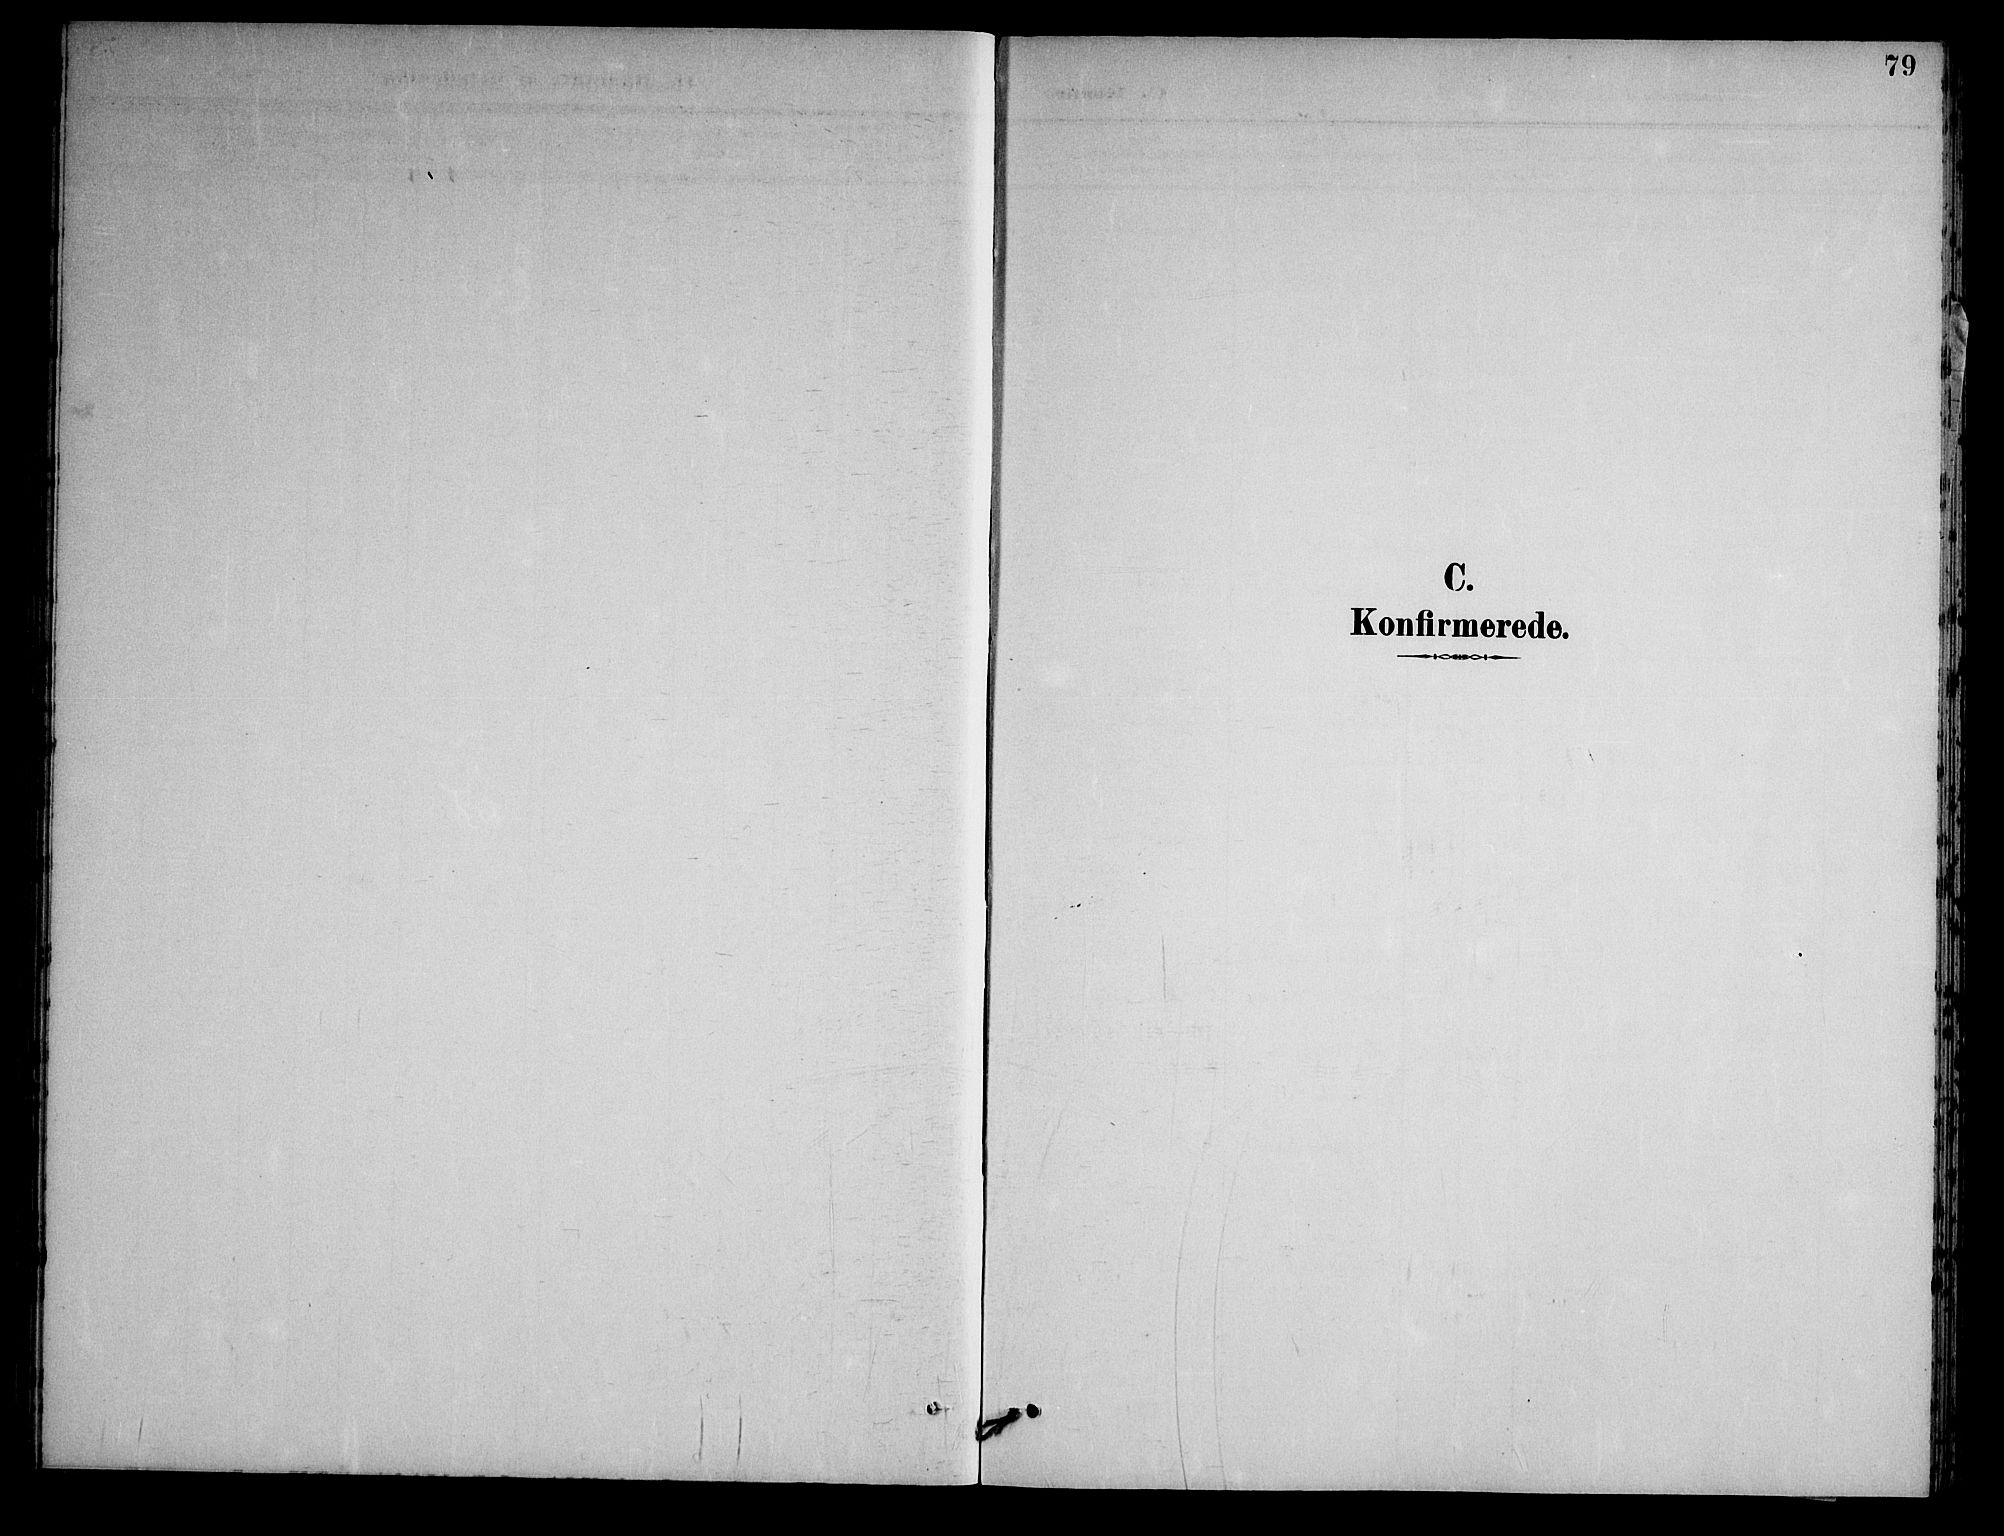 SAKO, Nissedal kirkebøker, G/Gb/L0003: Klokkerbok nr. II 3, 1893-1928, s. 79